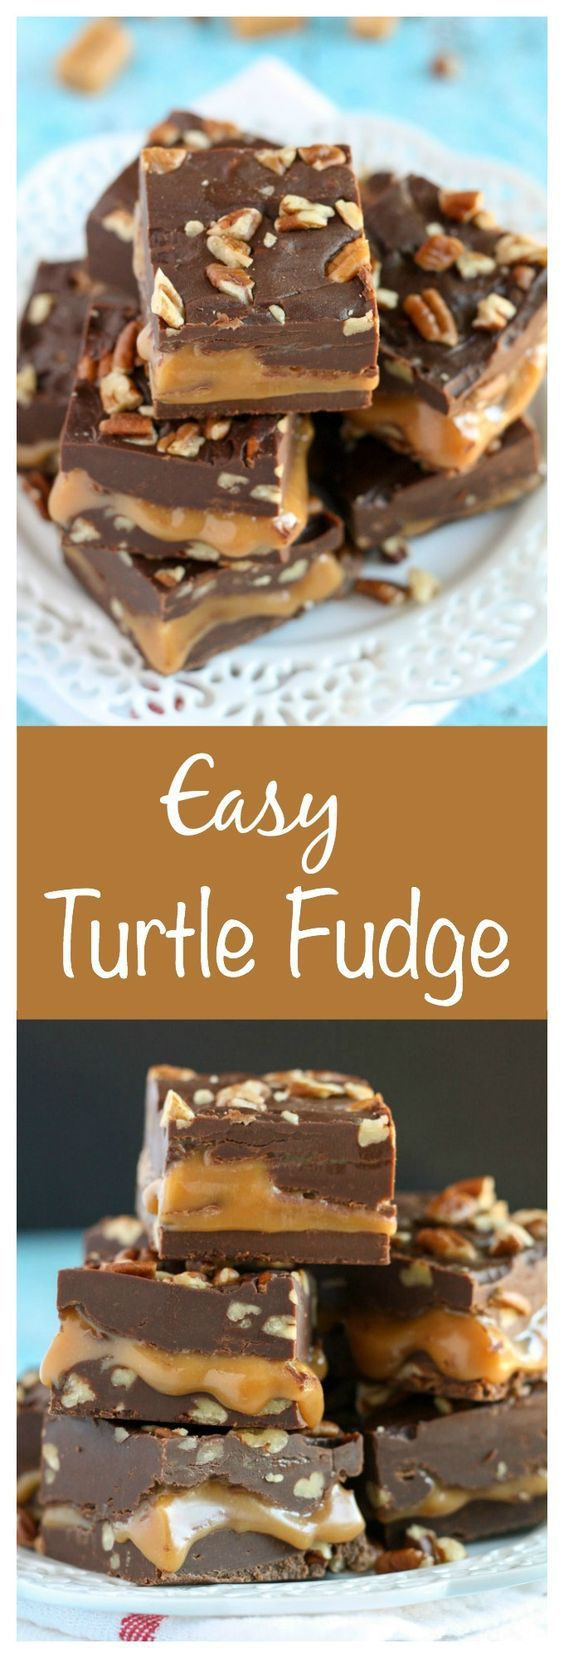 Best 25+ Easy chocolate fudge ideas on Pinterest | Quick fudge ...